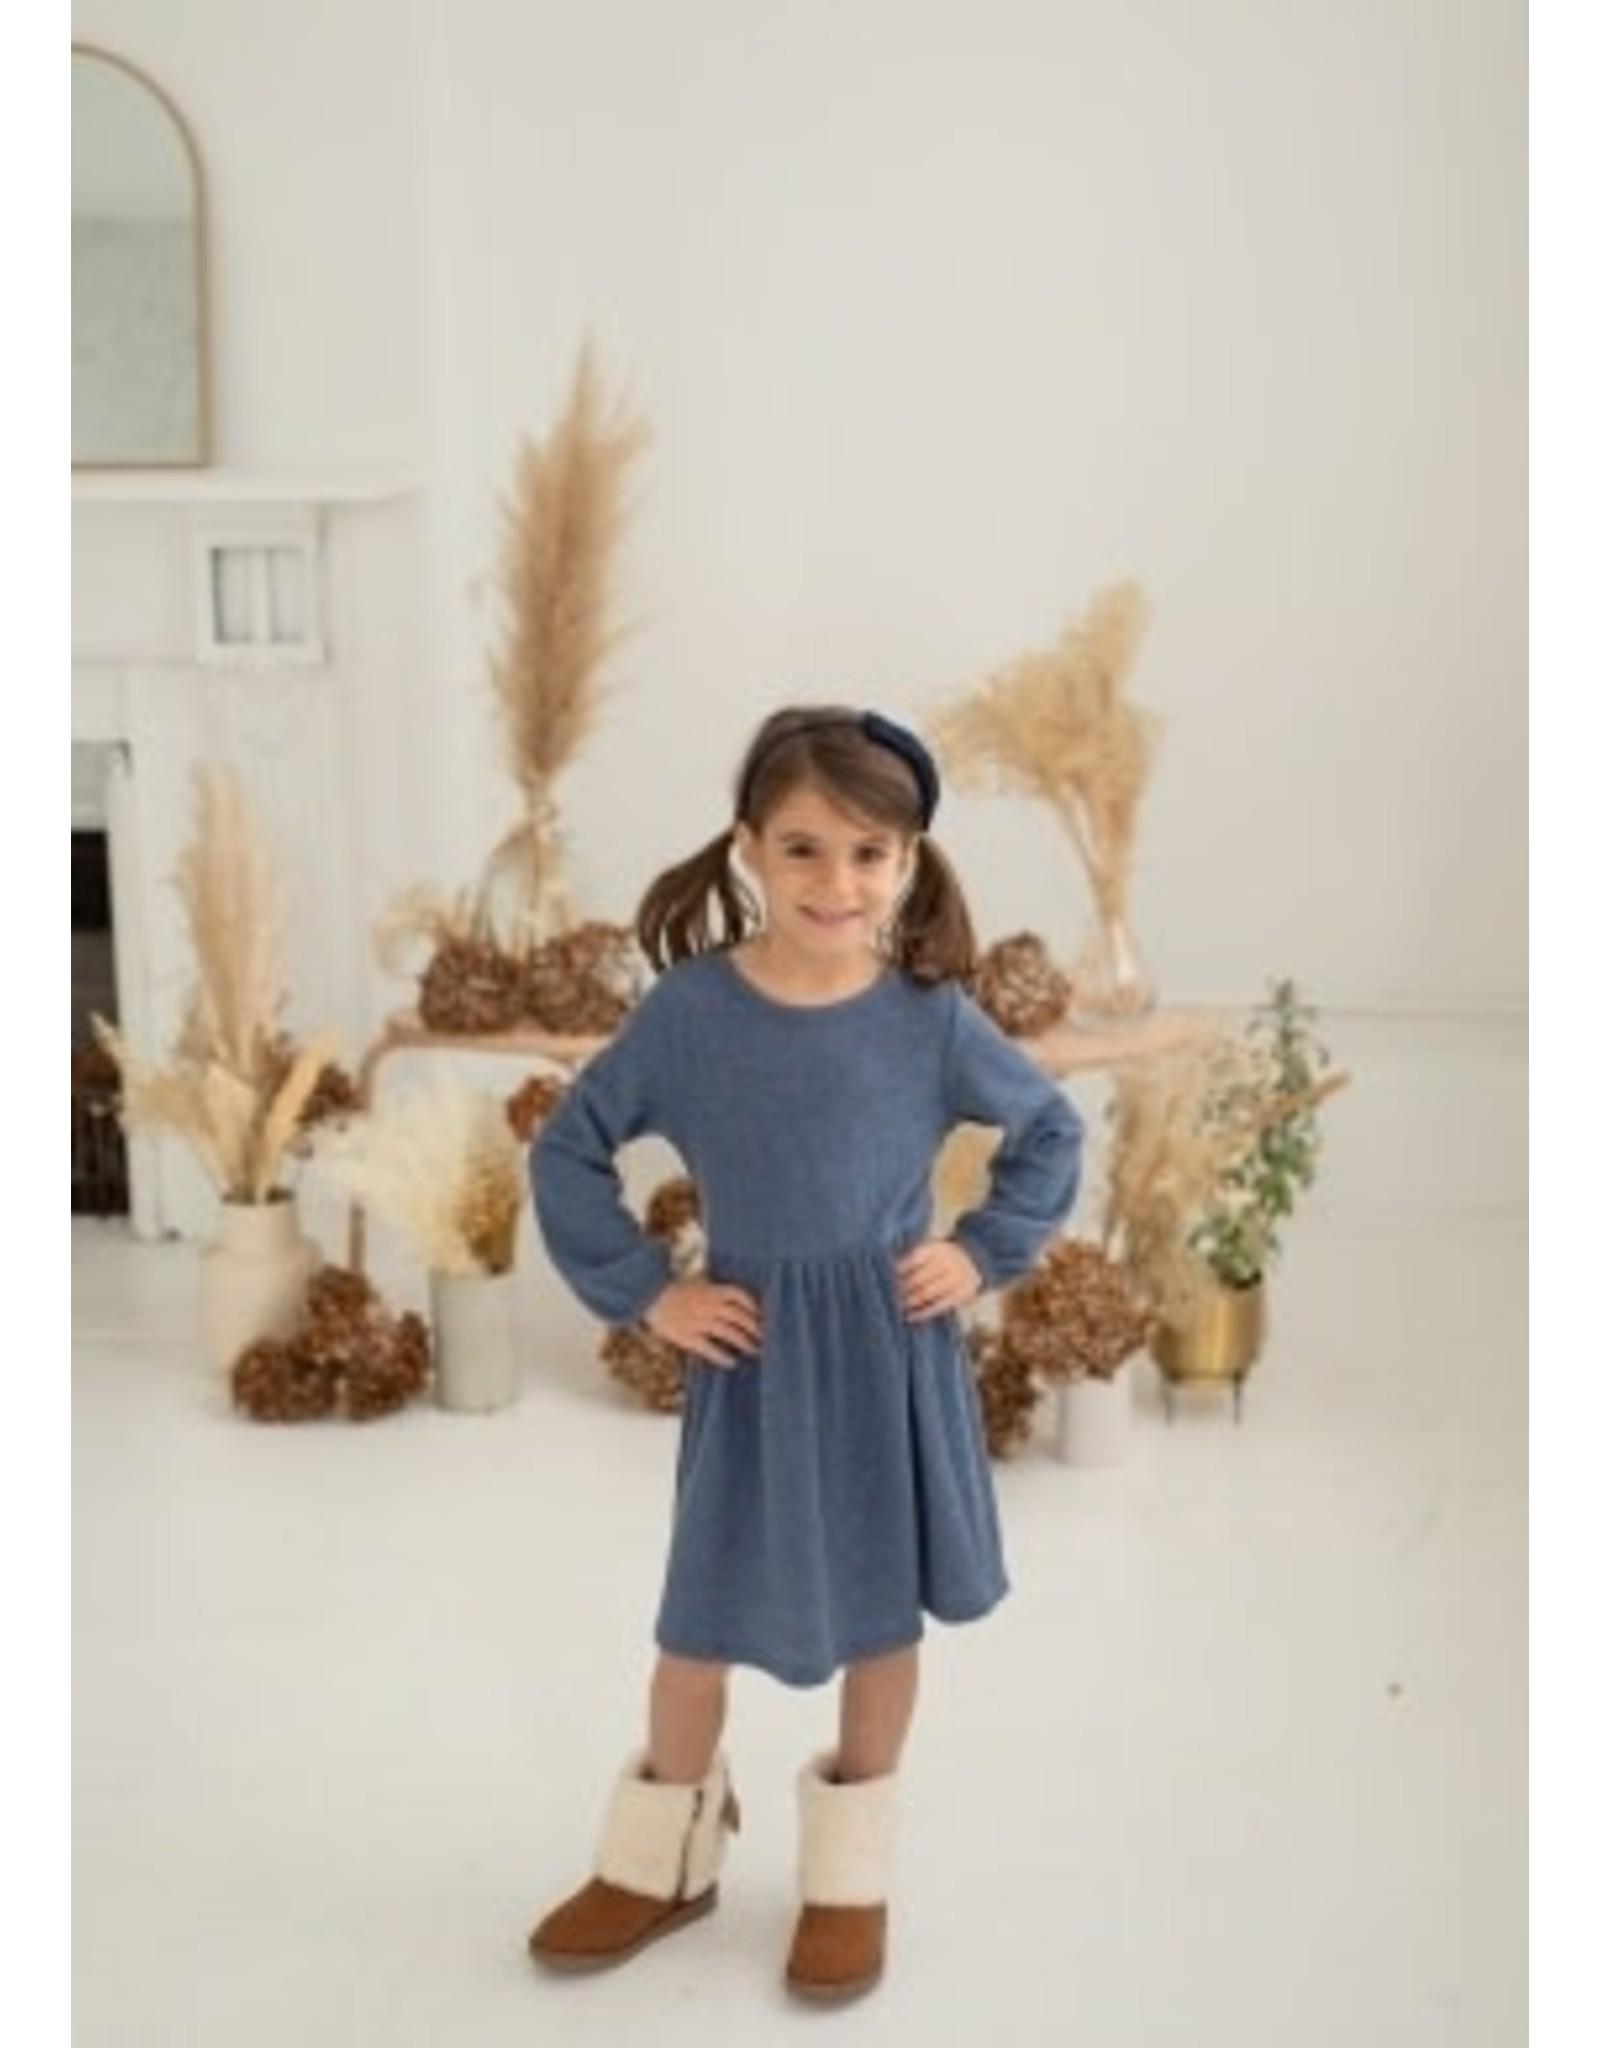 Mabel & Honey Mabel & Honey- Wispering Winds Knit Dress: Blue